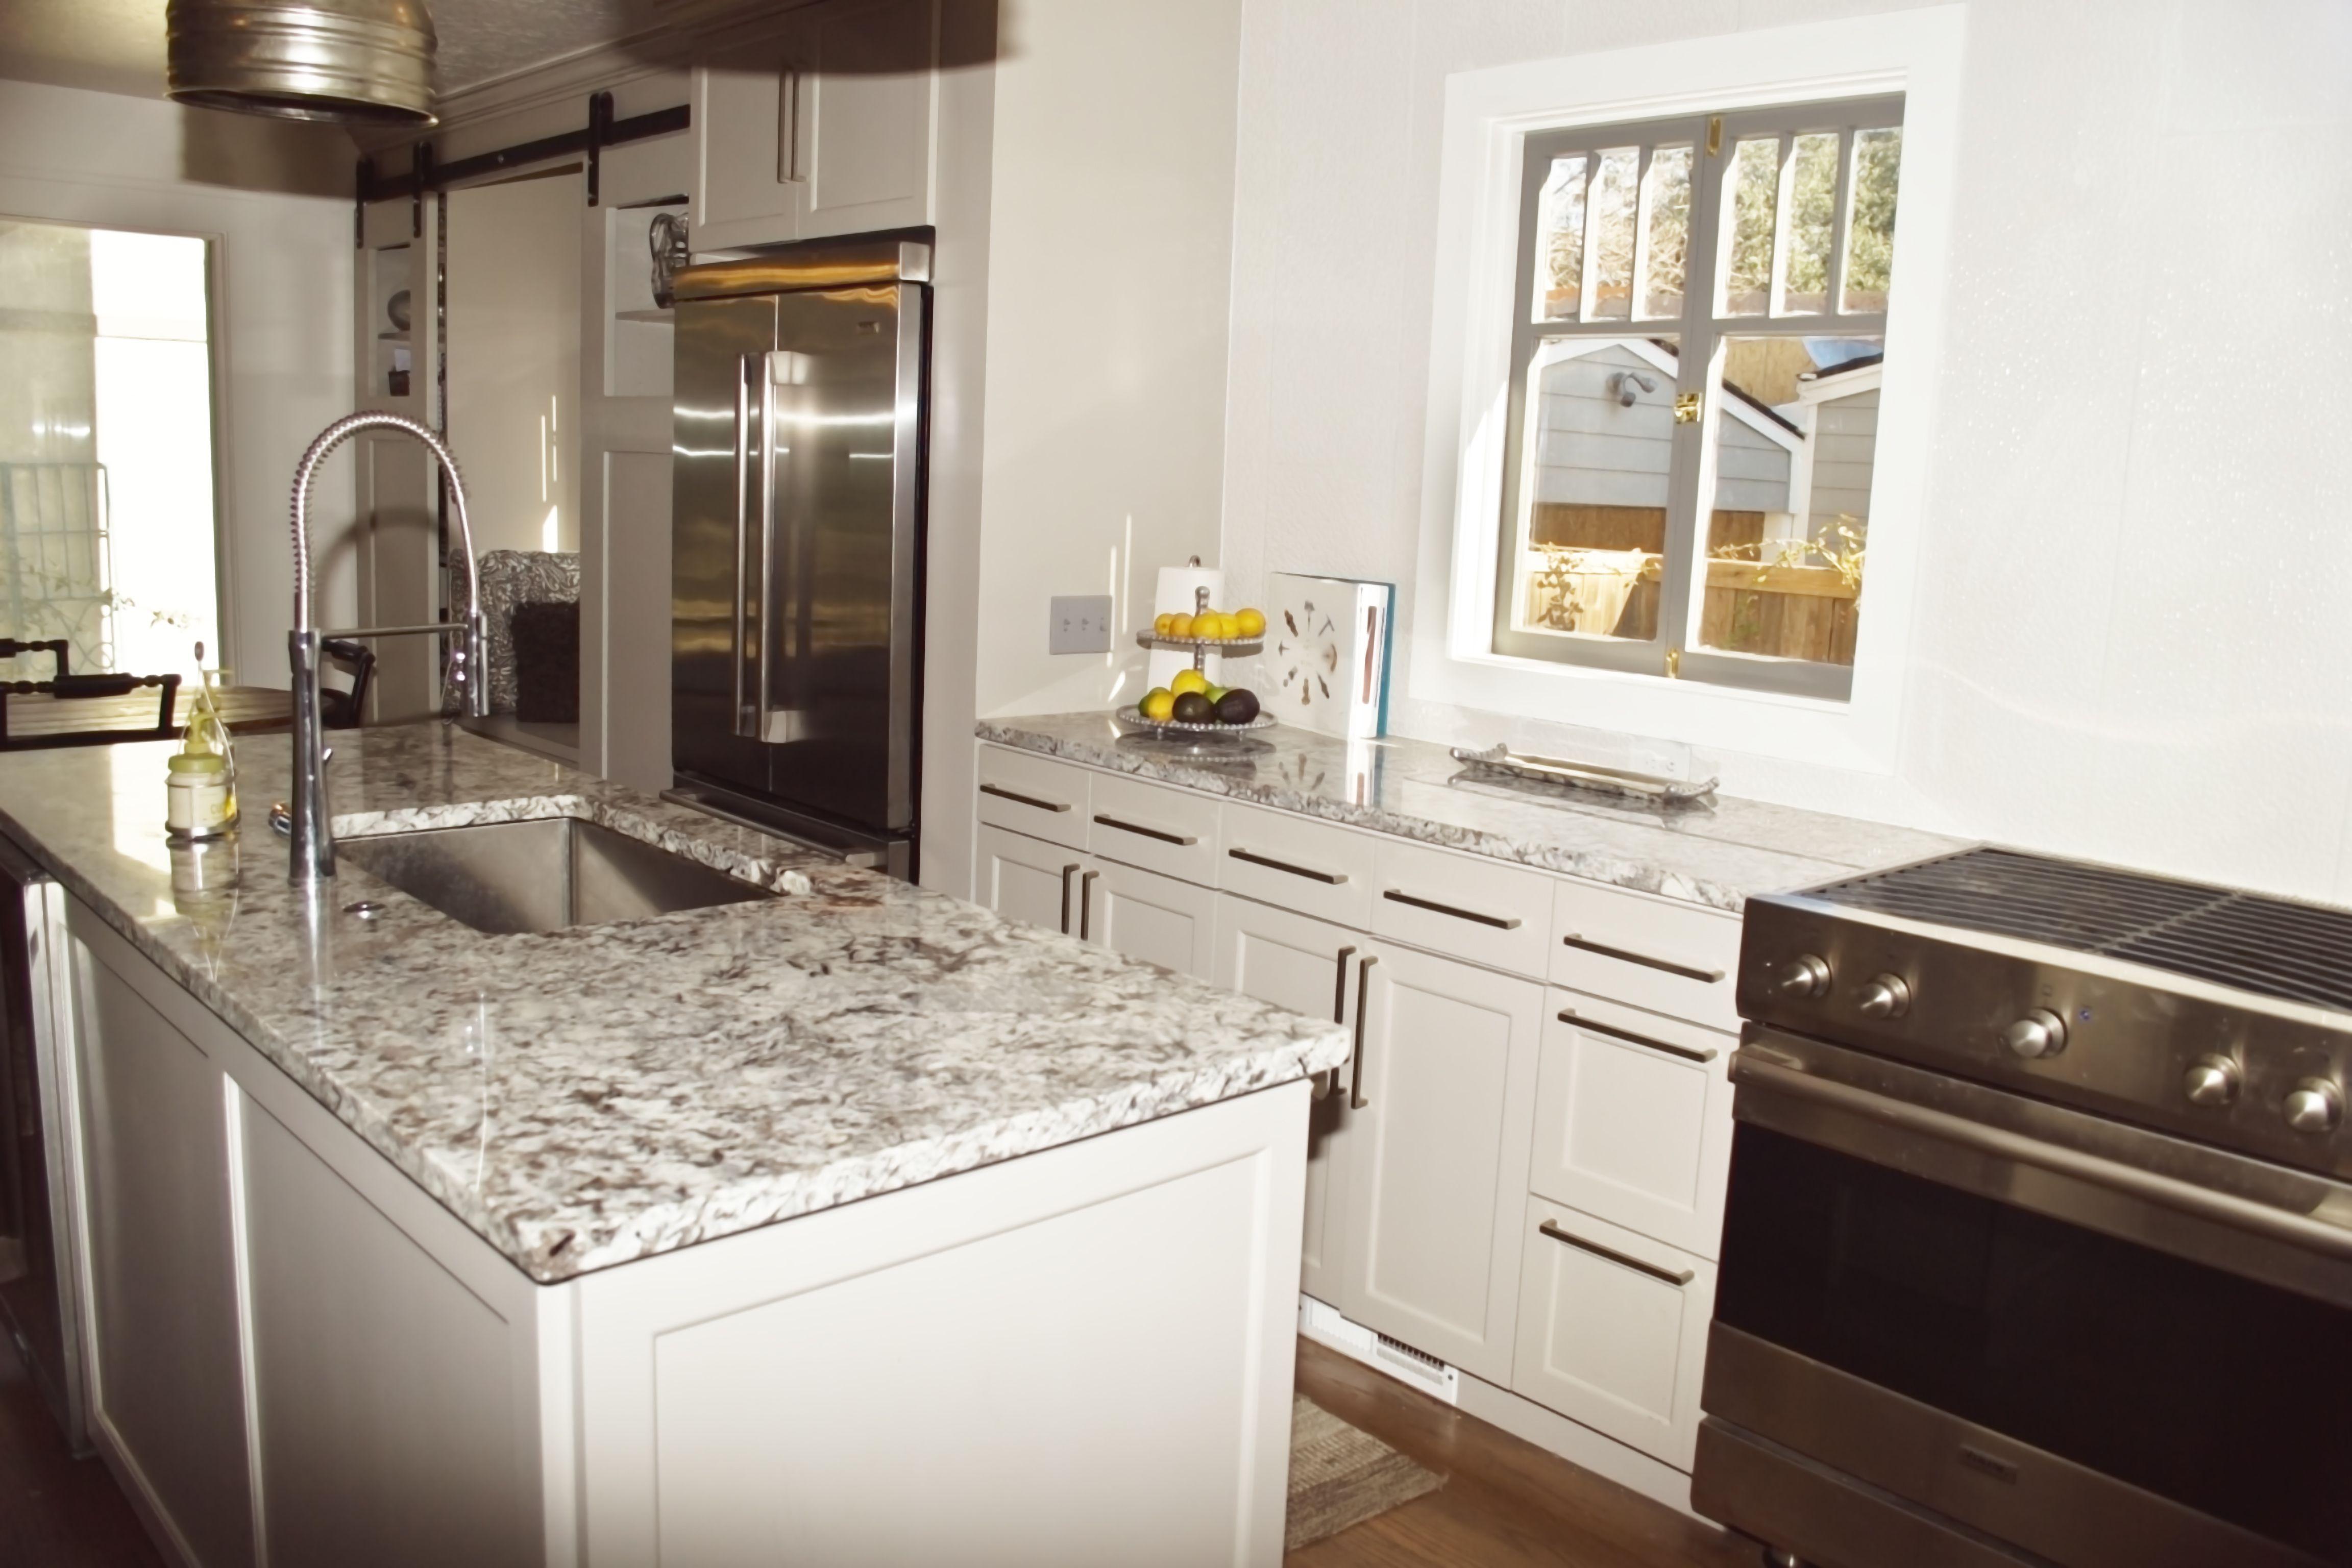 Granite Color Lennon Tile Splash Porcelanosa Cubica Blanco New Kitchen Kitchen Island Pendants Kitchen Island Lighting Pendant